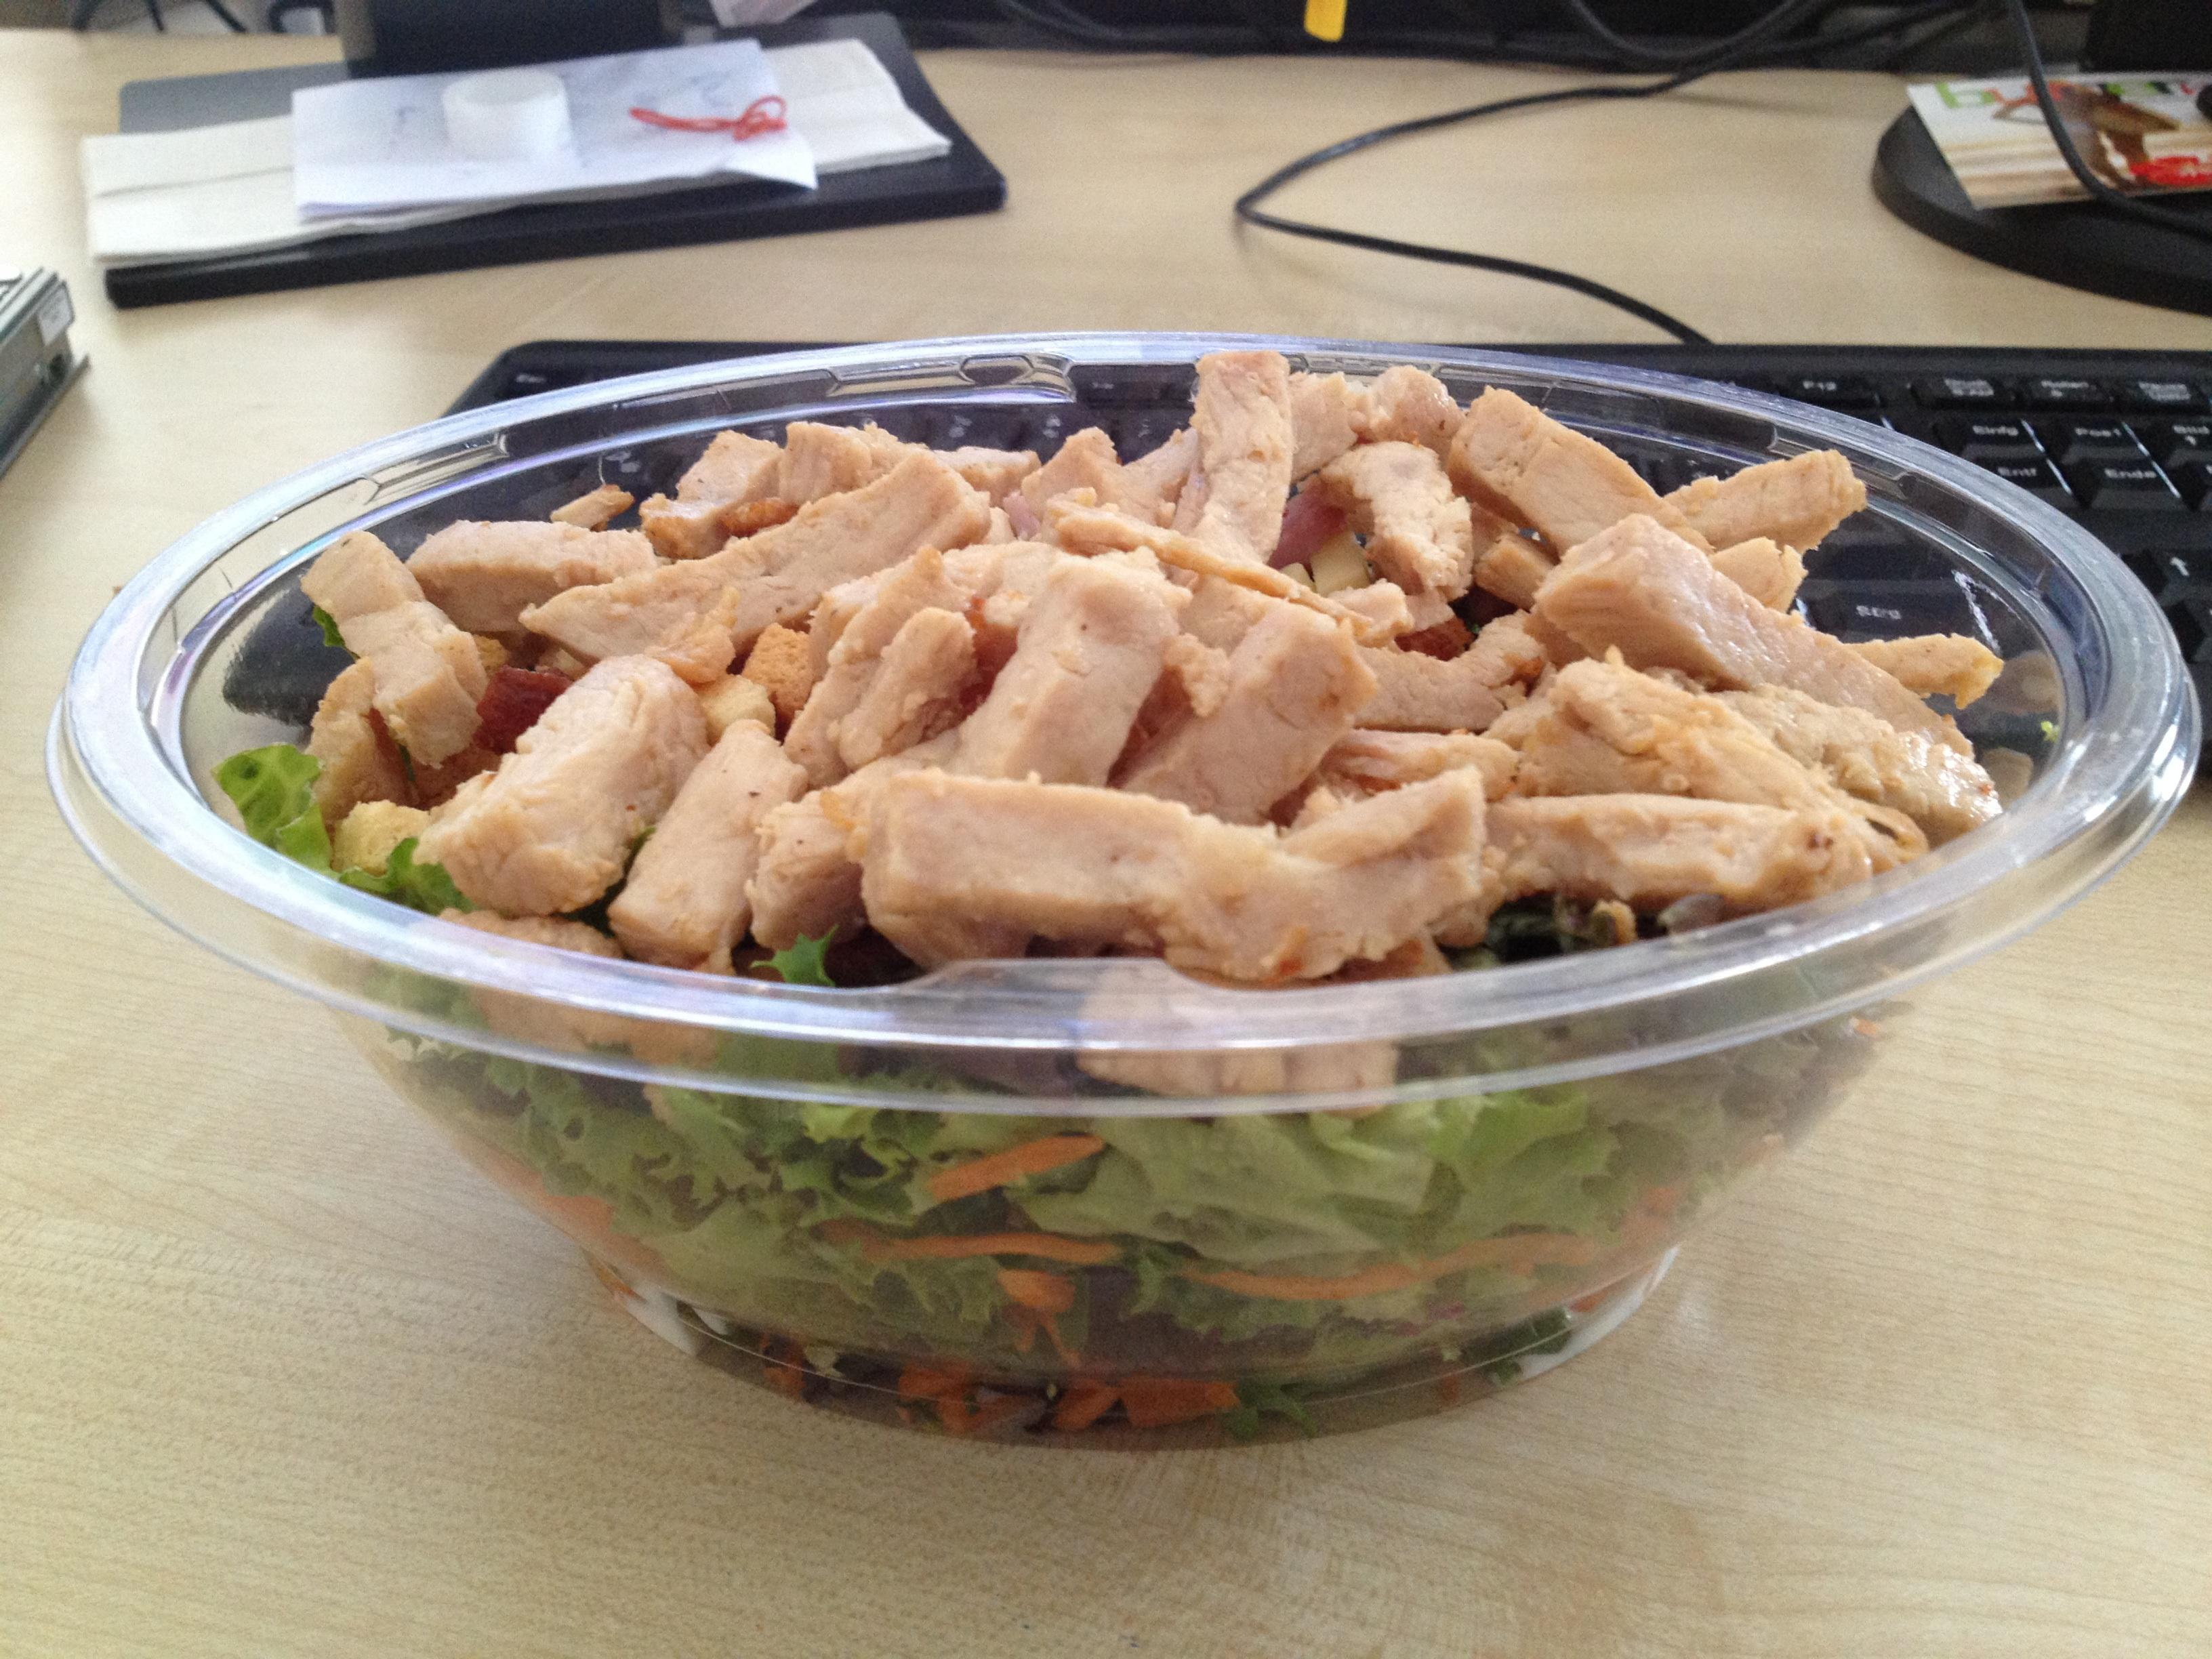 https://foodloader.net/BrollyLSSJ_2013-07-25_Trader_Joe_s_-_Frische_Salate_-_Kaese_&_Schinken_mit_Putenbrust-Streifen.jpg